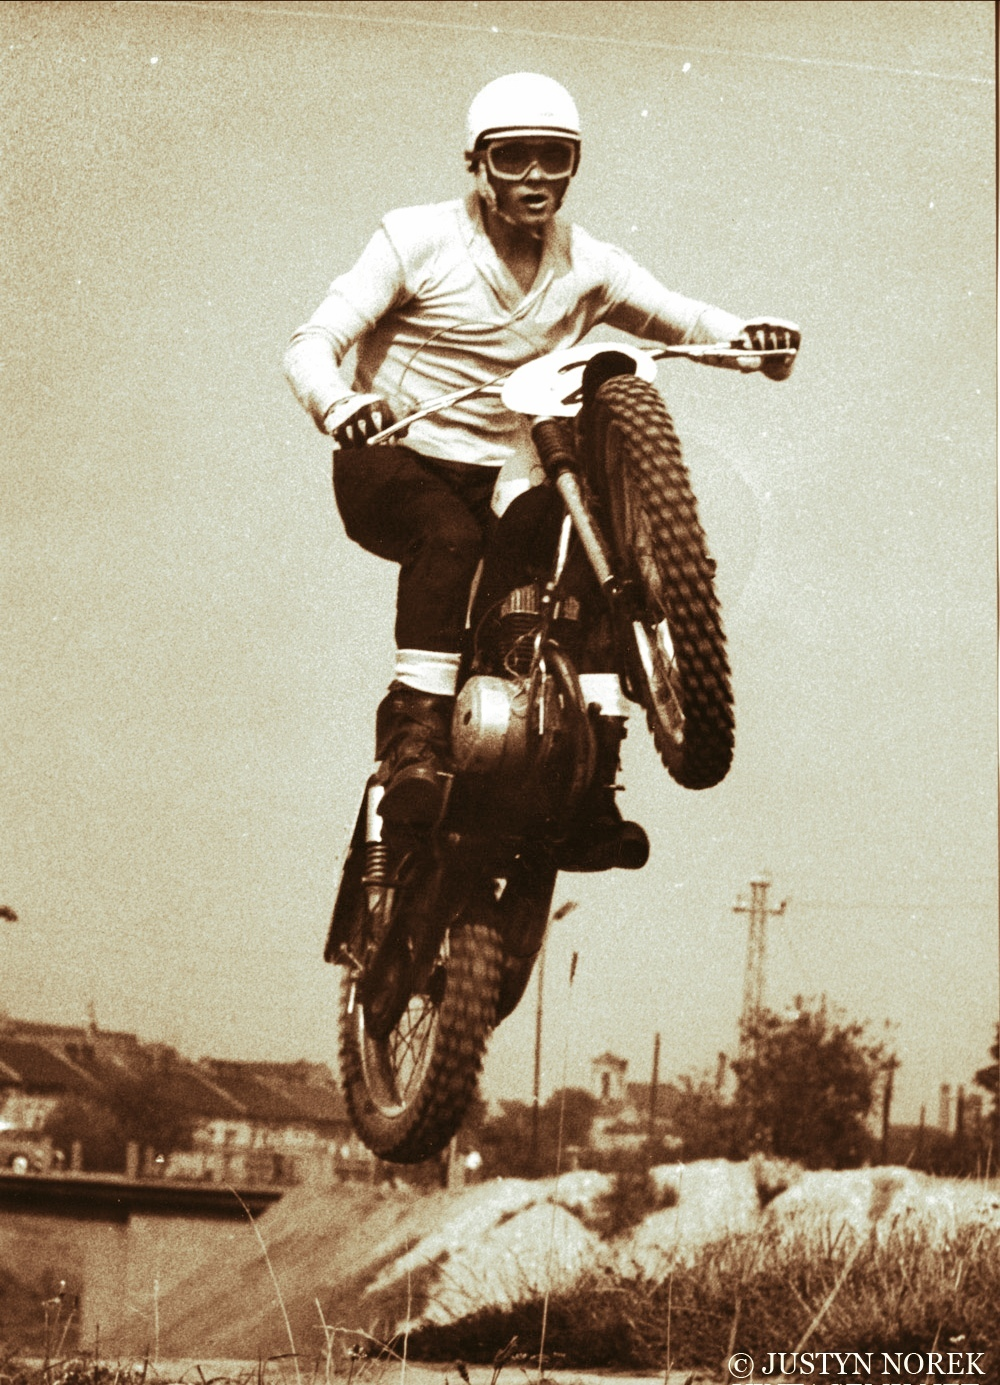 vintage-GP-1960s-28.jpg#asset:37258